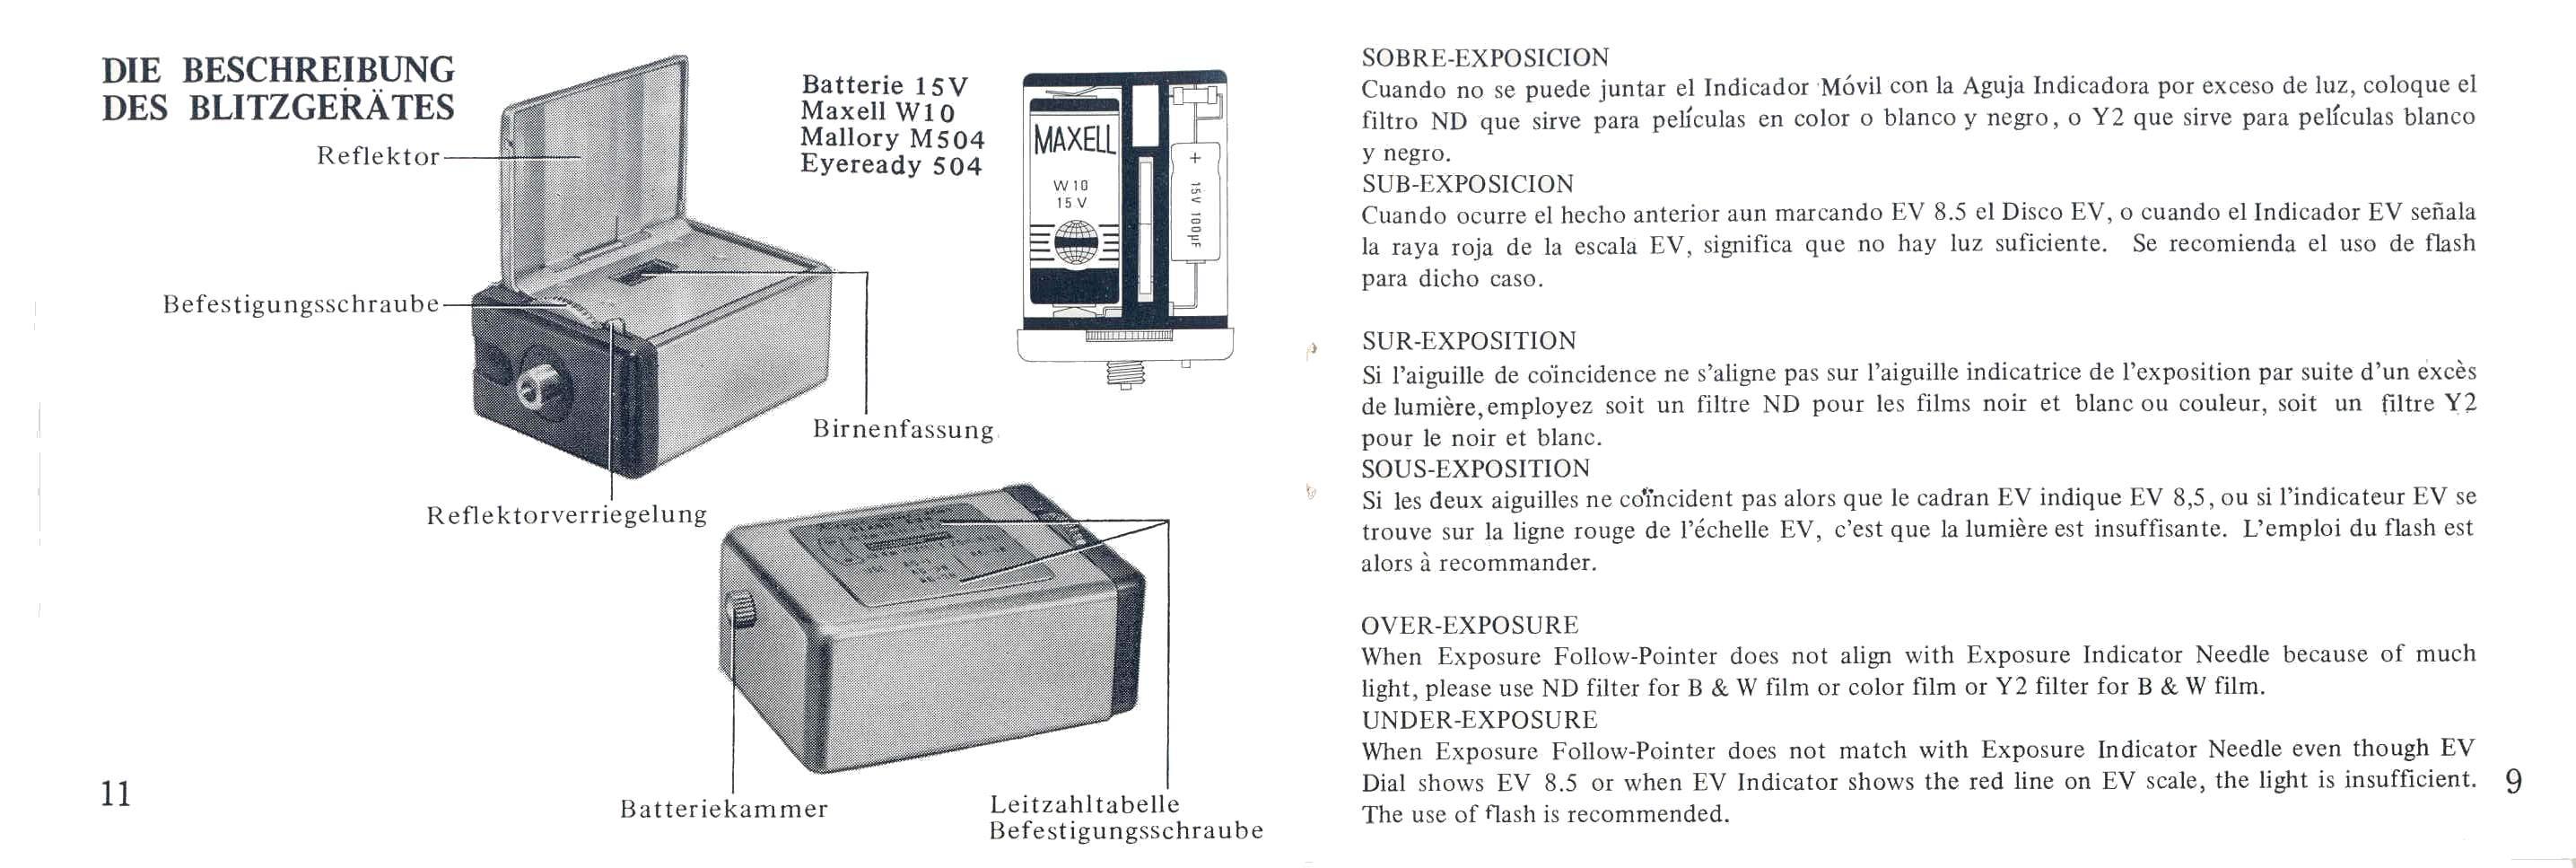 Porst KX 50 Manual